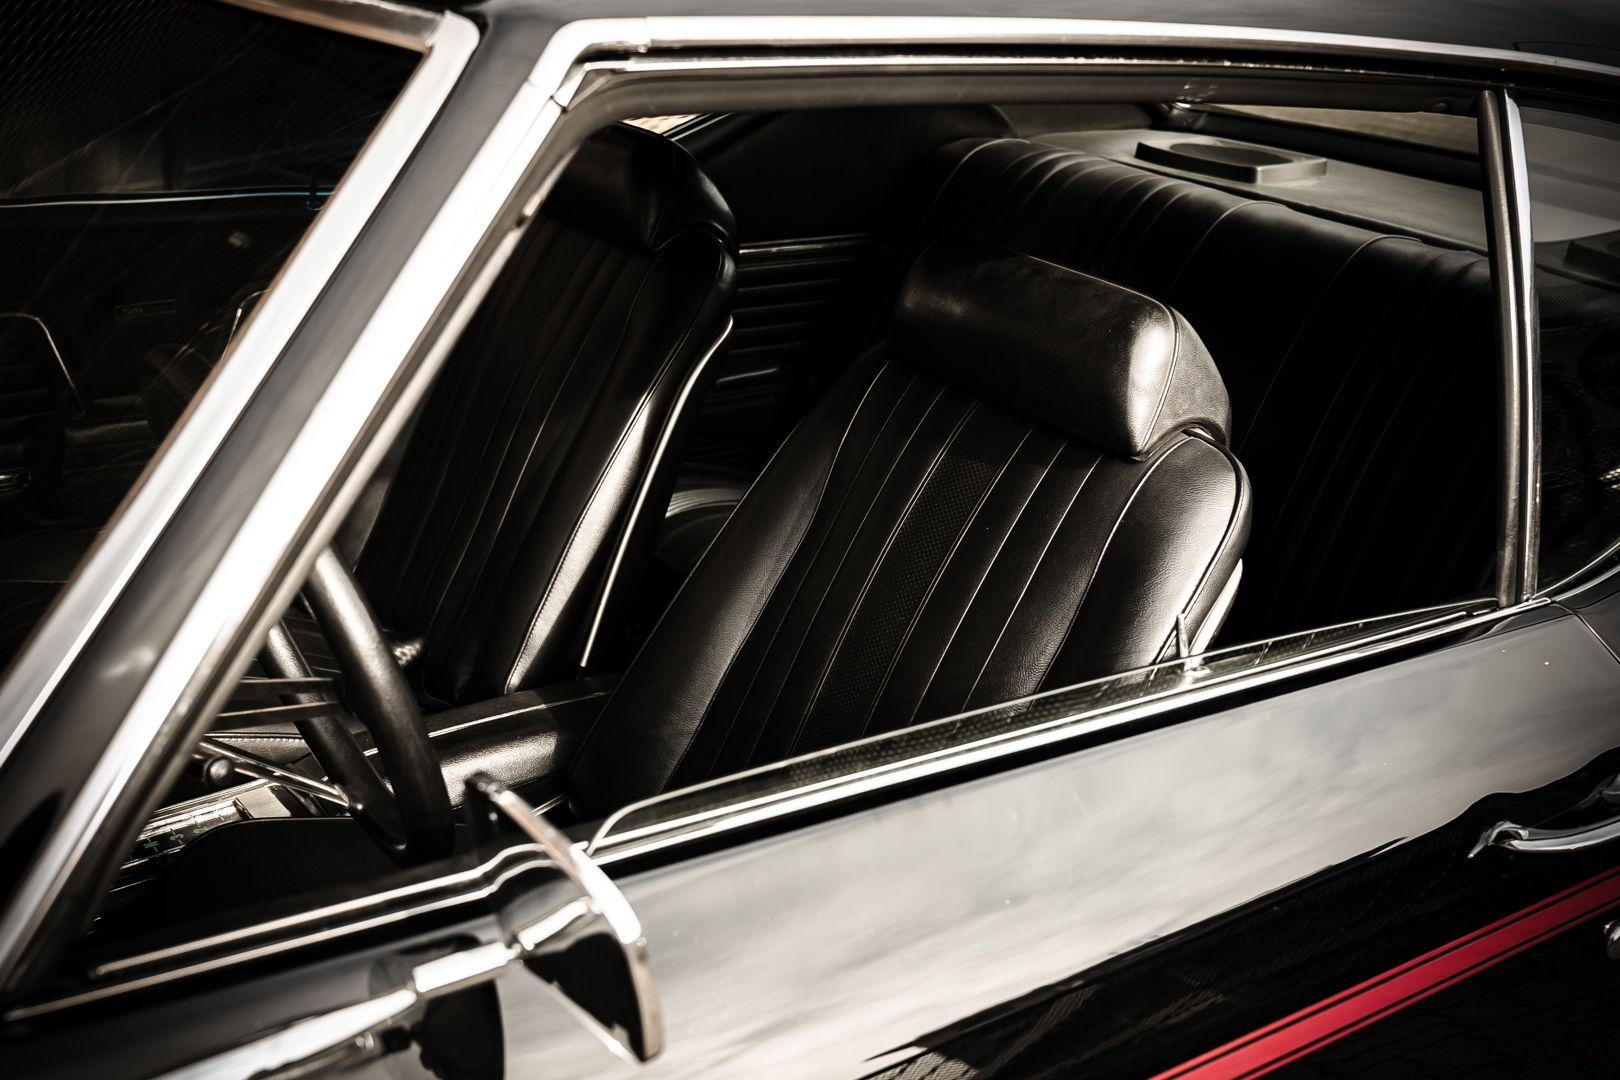 1969 Chevrolet Chevelle SS 62969